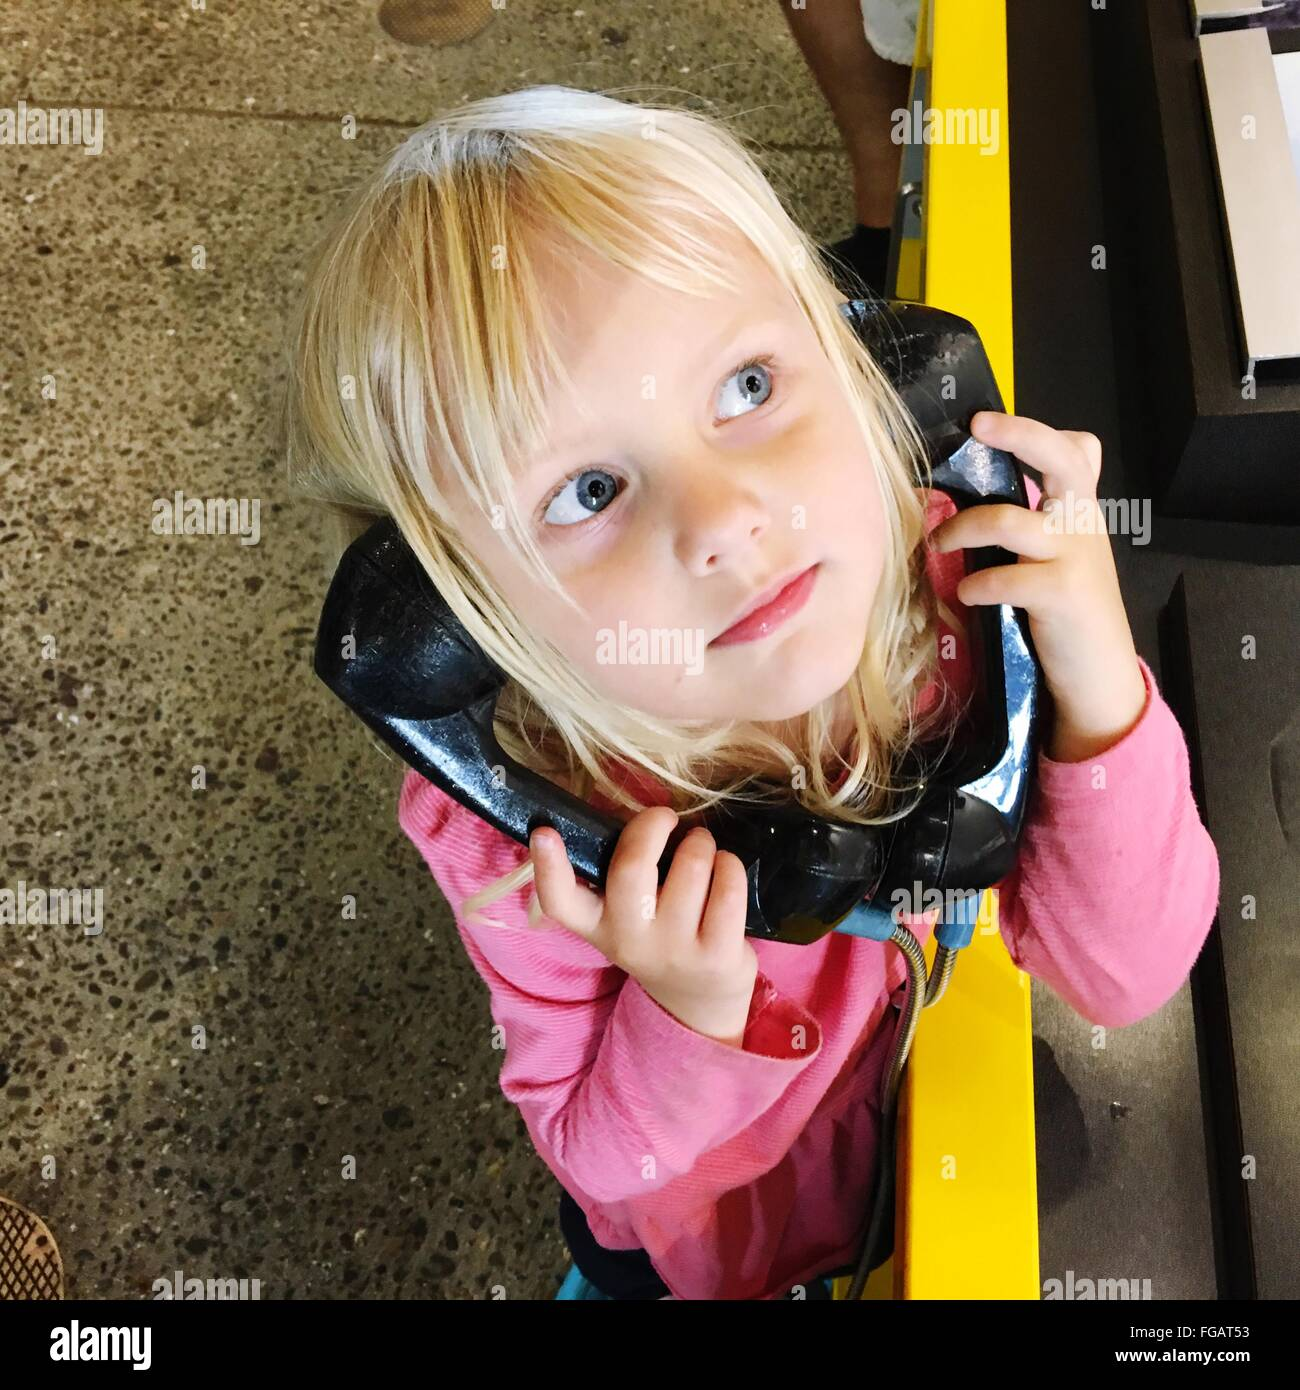 High Angle View Of Girl Telefon Empfänger auf Stand halten Stockbild